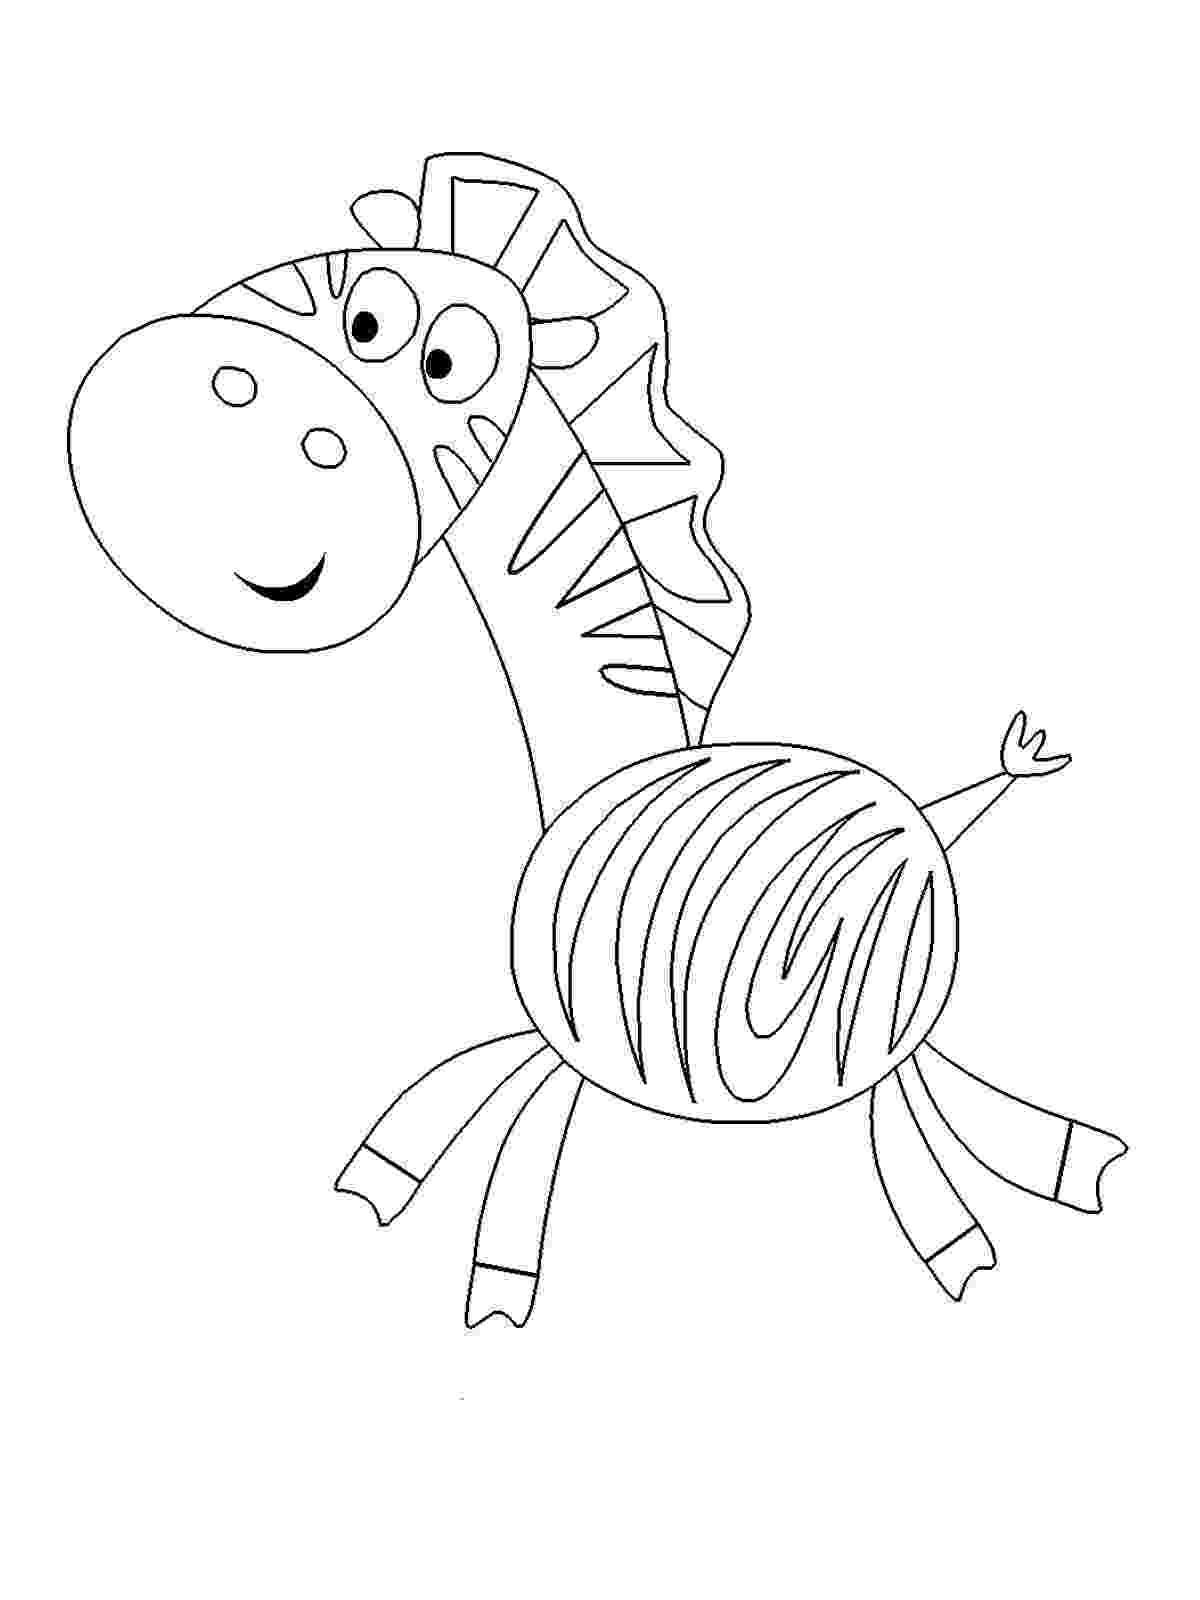 color sheets printable printable coloring pages for kids coloring pages for kids sheets color printable